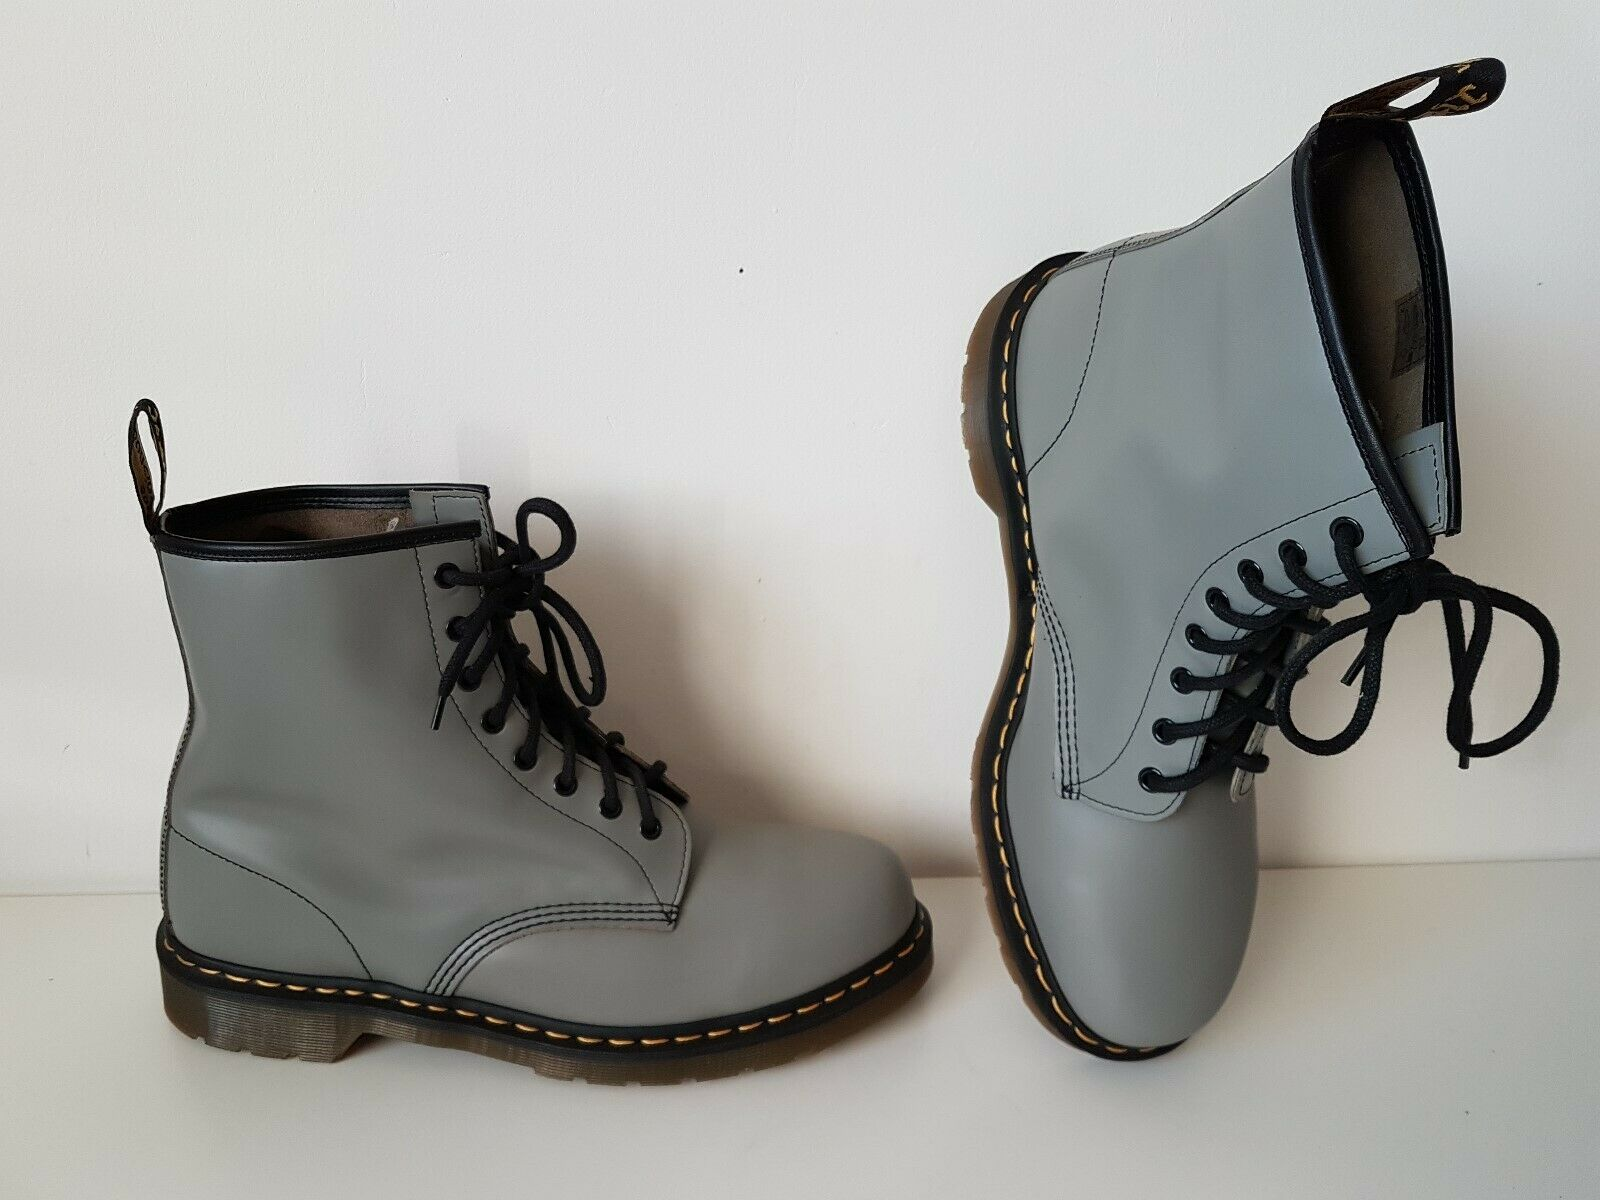 UK 13 EU 48 US 14 Dr. Martens 1460 grey Boots 8 eye leather